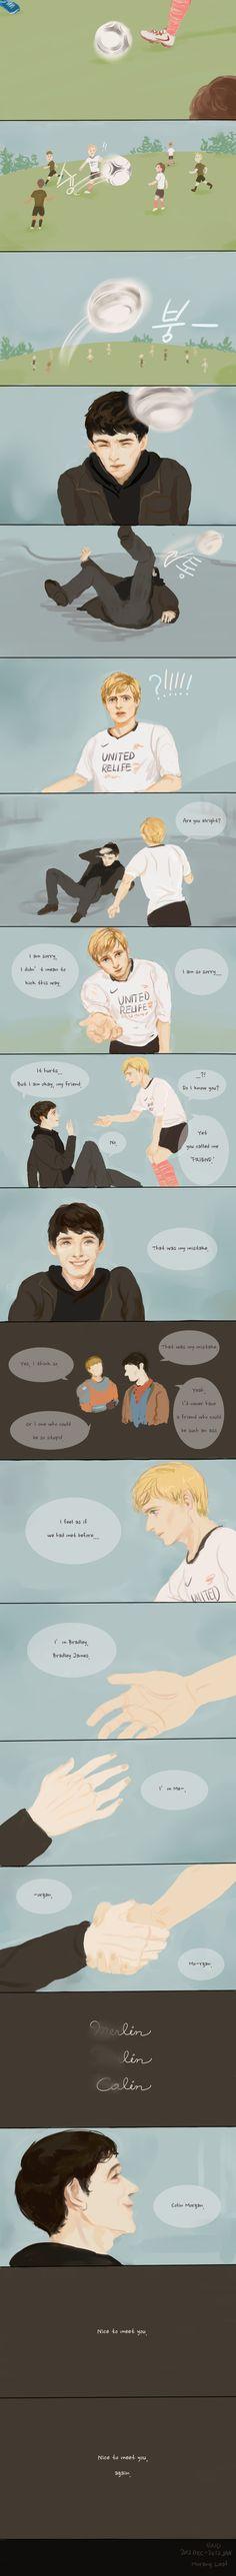 Merlin, Colin, and Bradley